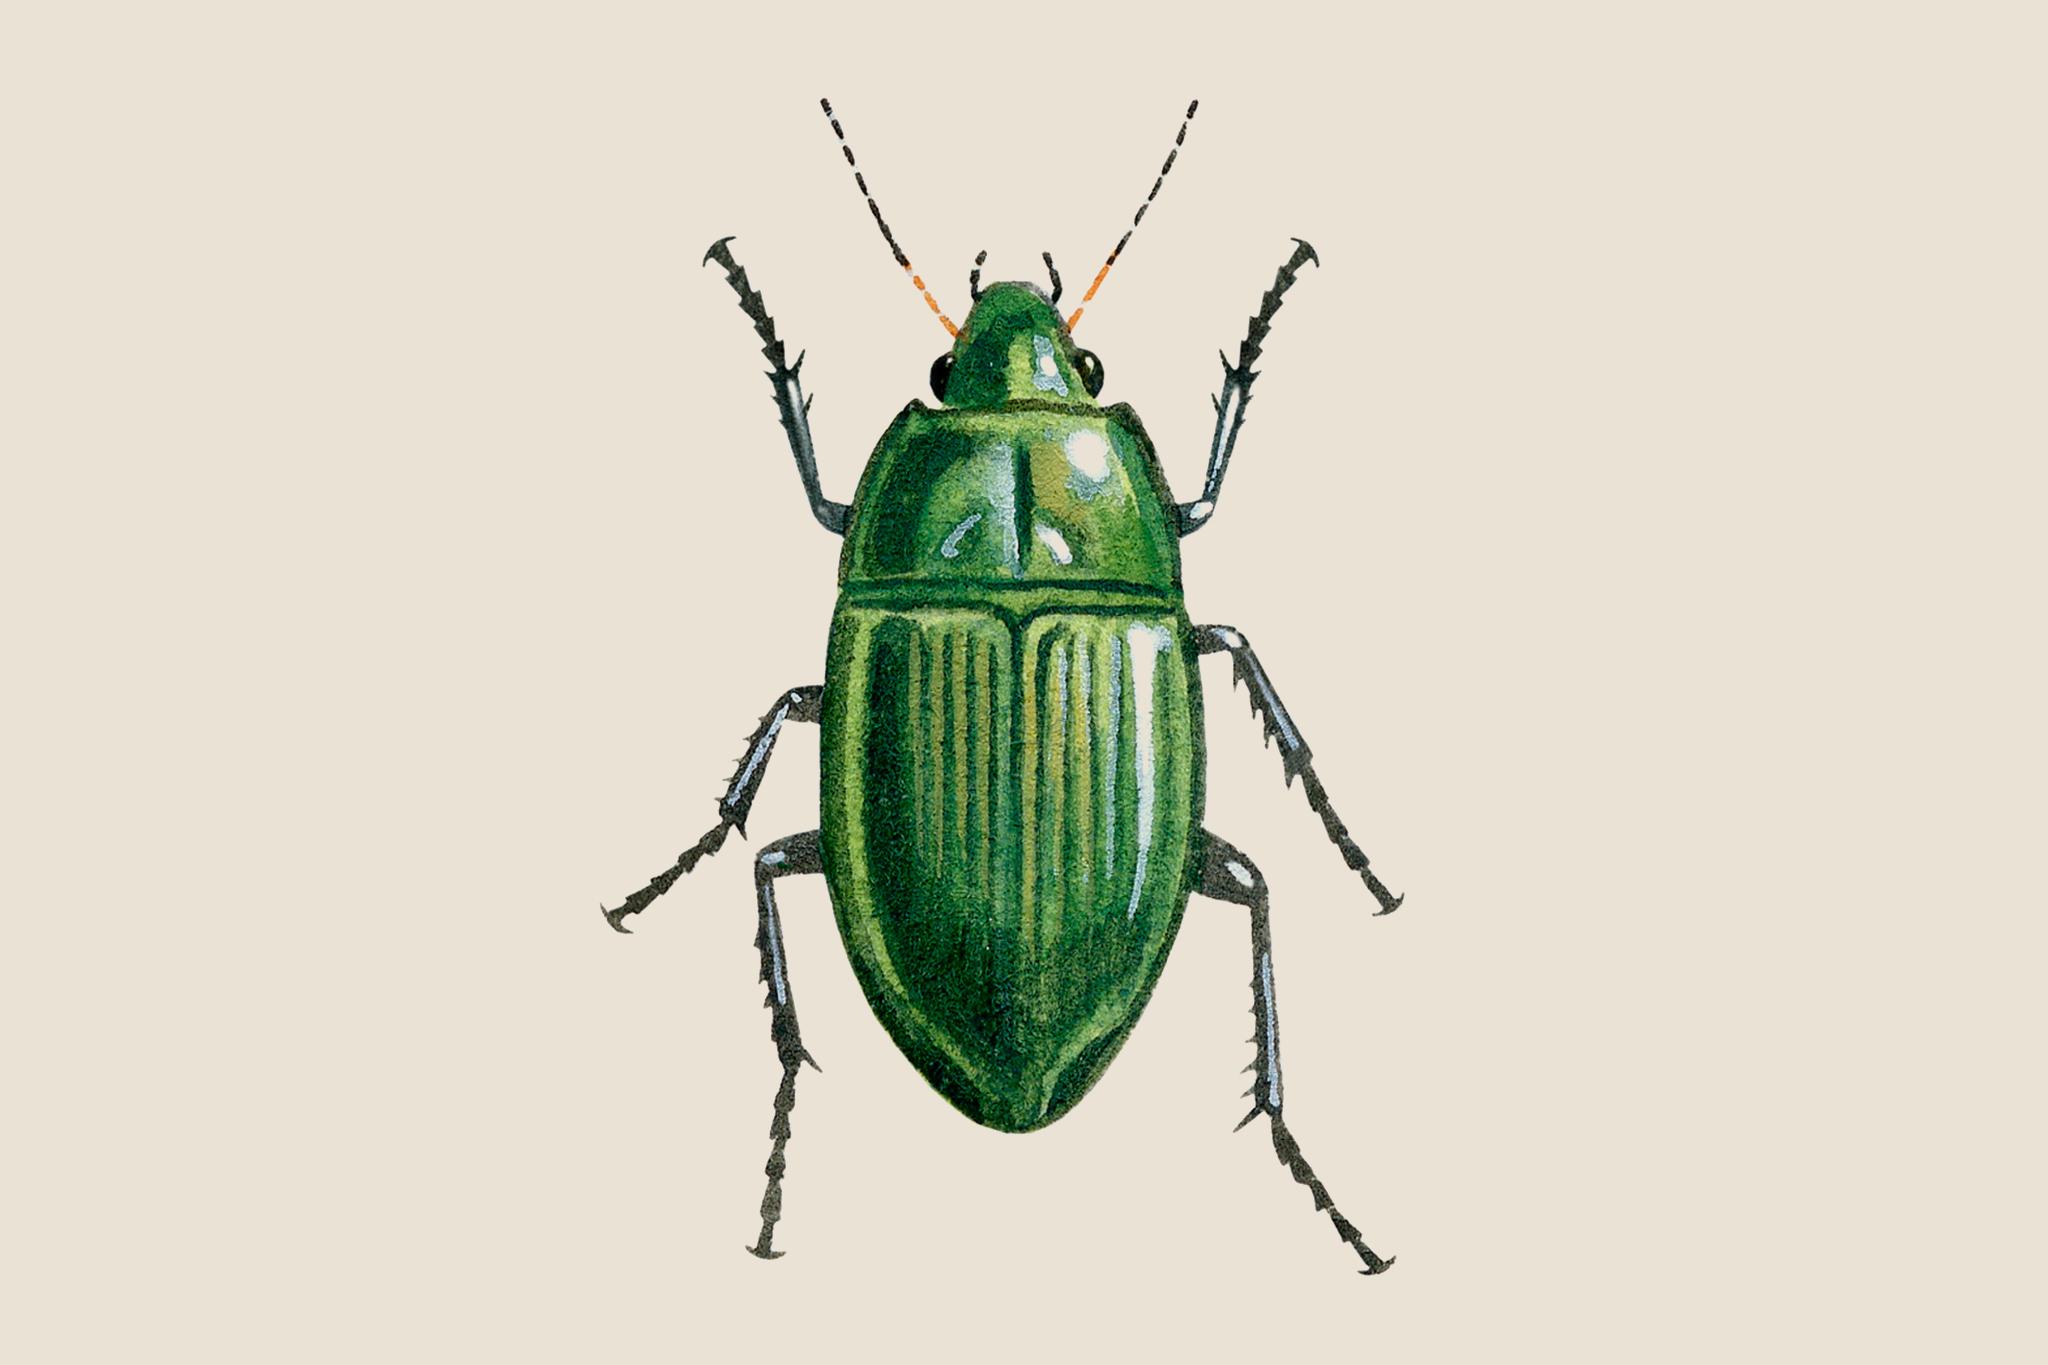 Sun beetle, Amara aenea